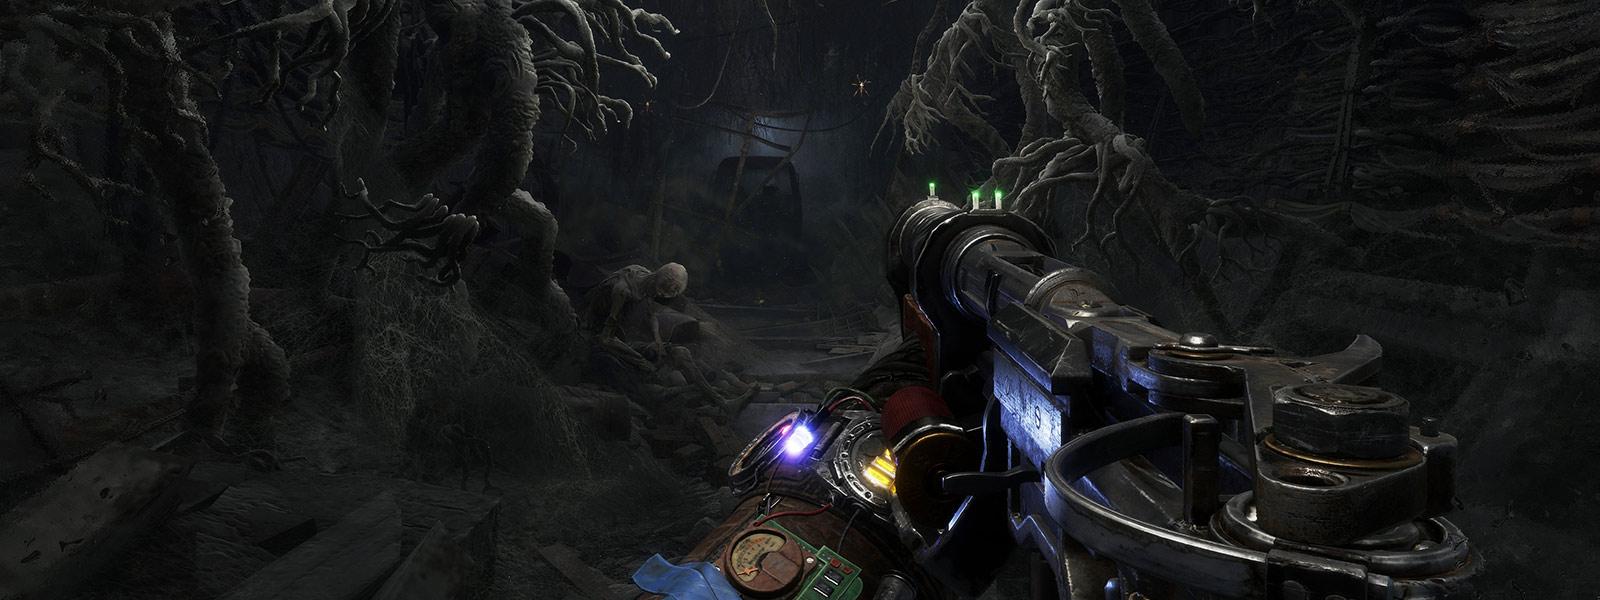 Beväpnad i underjorden